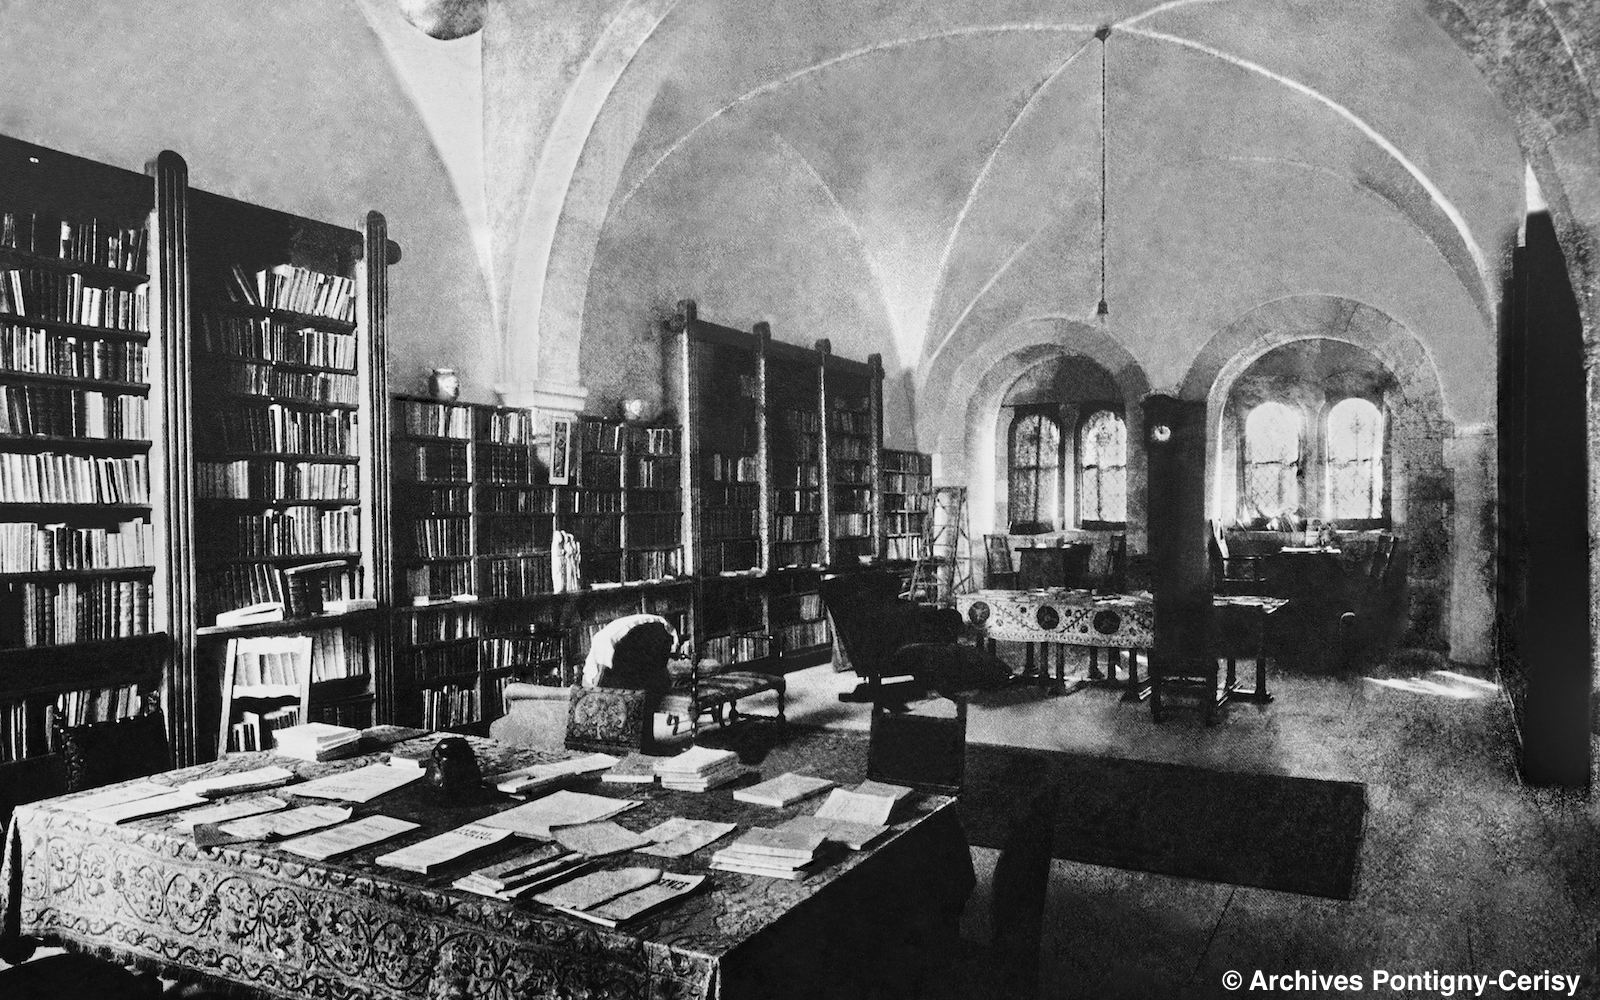 La bibliothèque de Pontigny